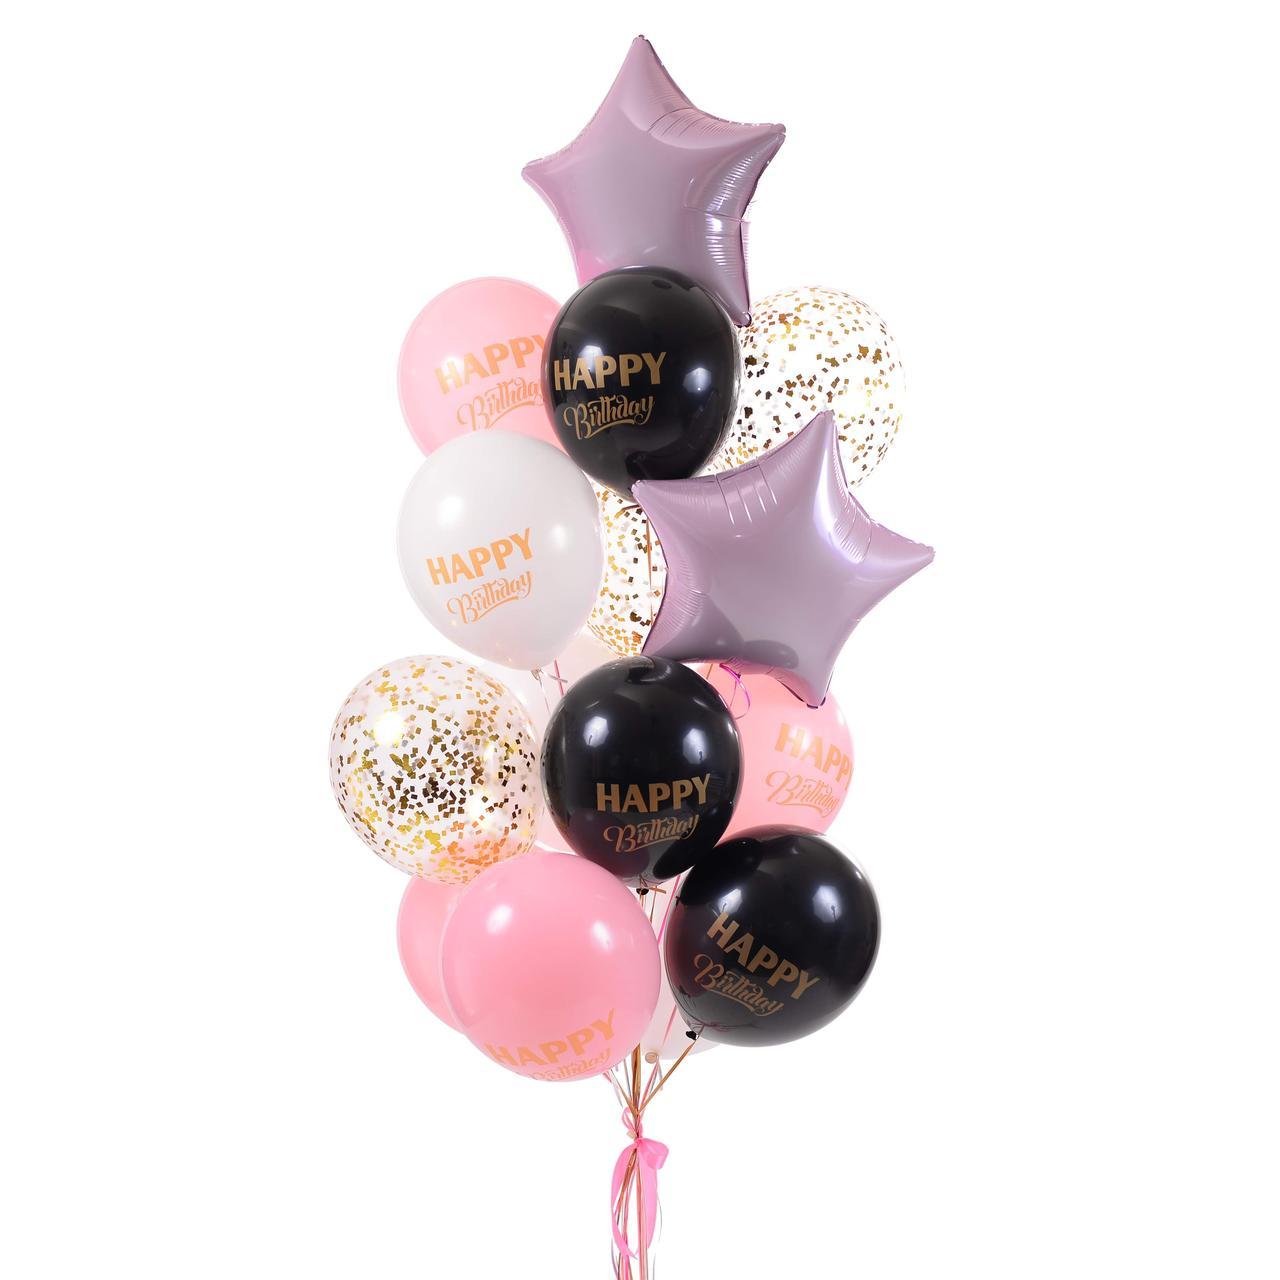 Связка Happy Birthday с розовыми звездами и шариками с конфетти